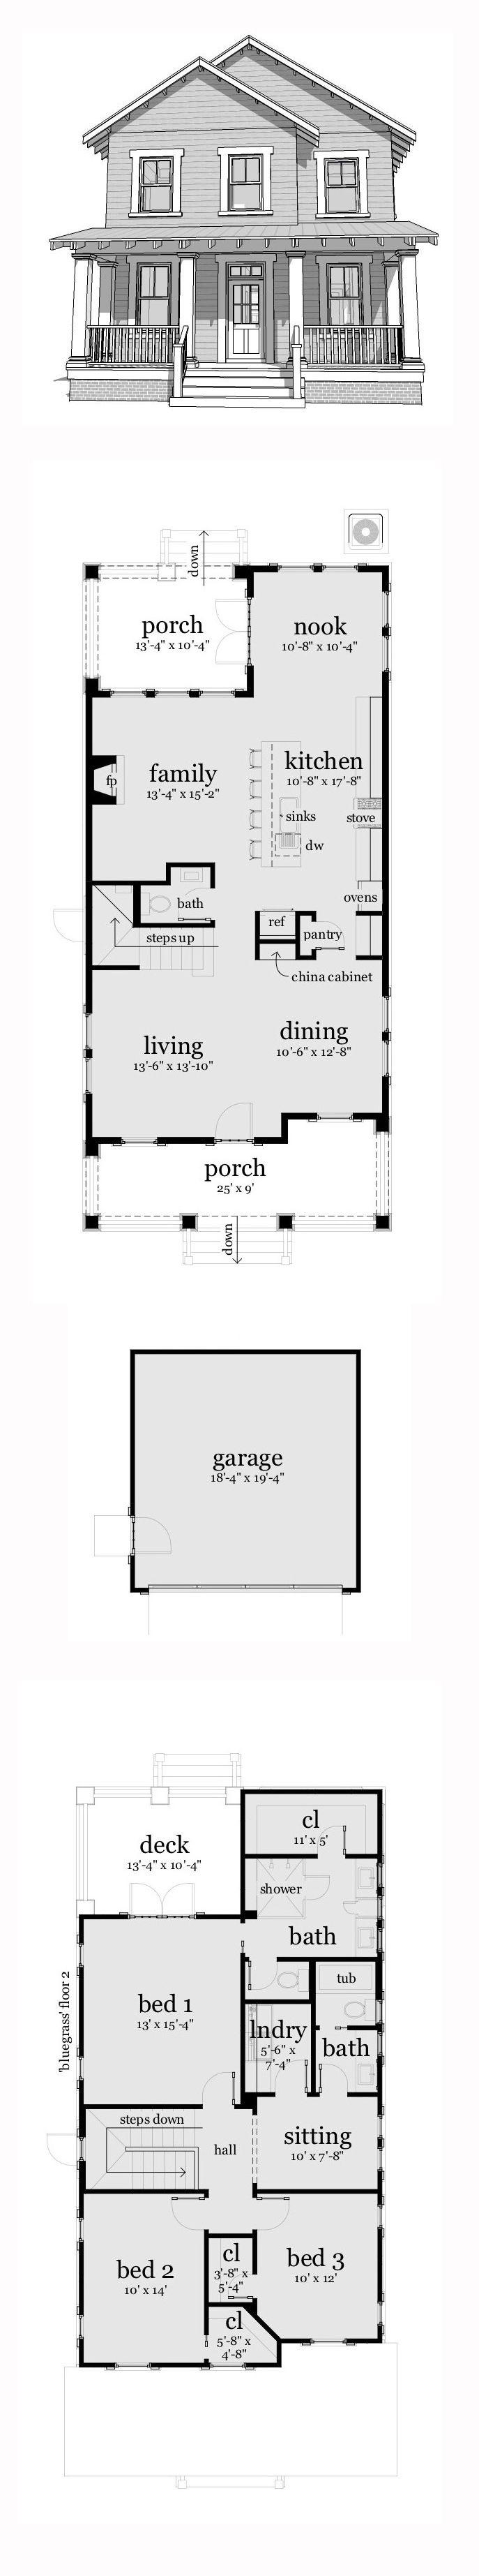 farmhouse house plan 70816 - Very Narrow Lot House Plans